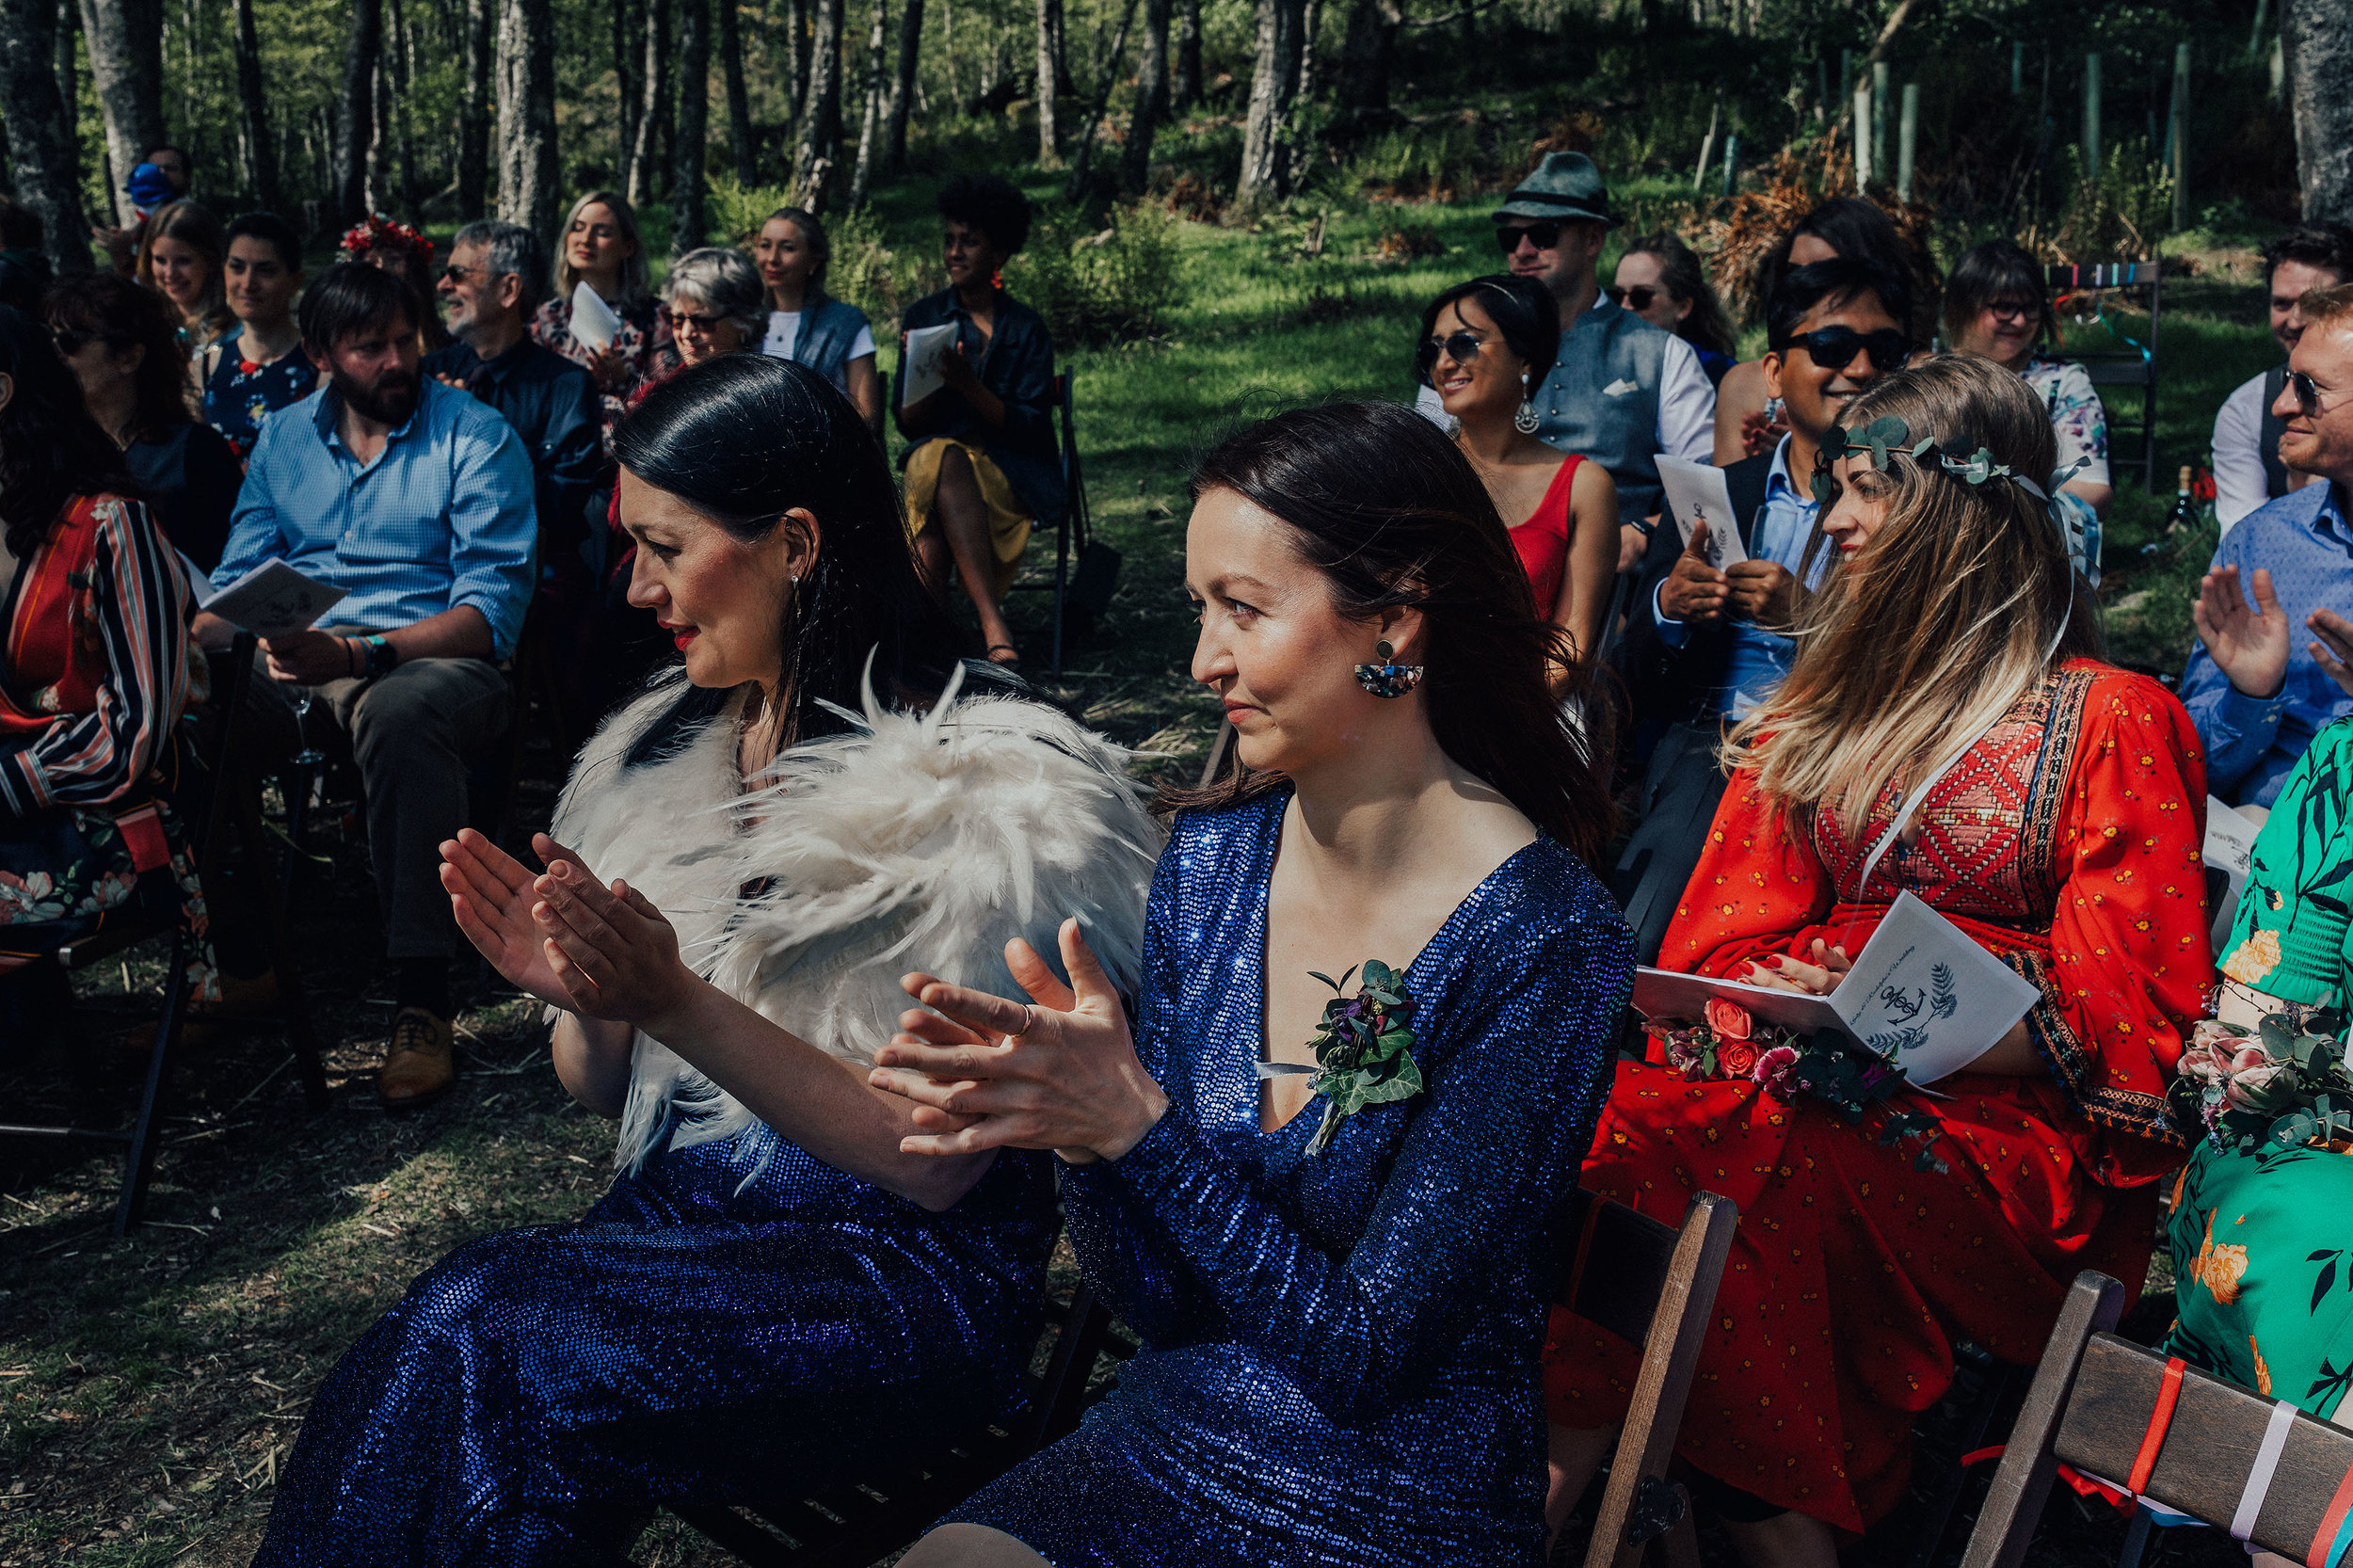 COMRIE_CROFT_WEDDINGS_PJ_PHILLIPS_PHOTOGRAPHY_77.jpg